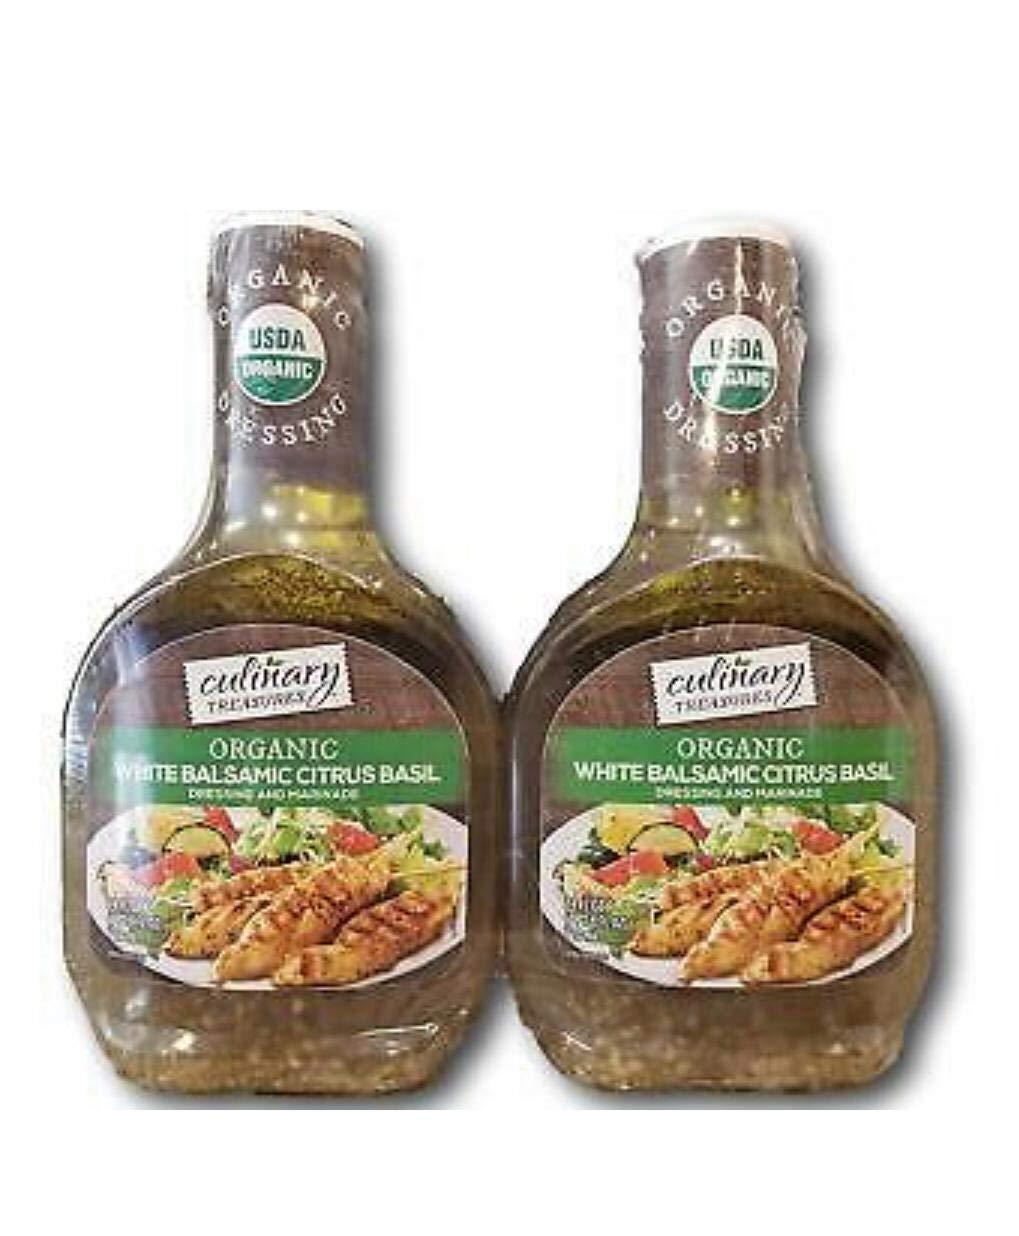 Culinary Treasures Organic White Balsamic Citrus Basil Dressing, 24 fl oz, Pack of 2 Bottles by Culinary Treasures